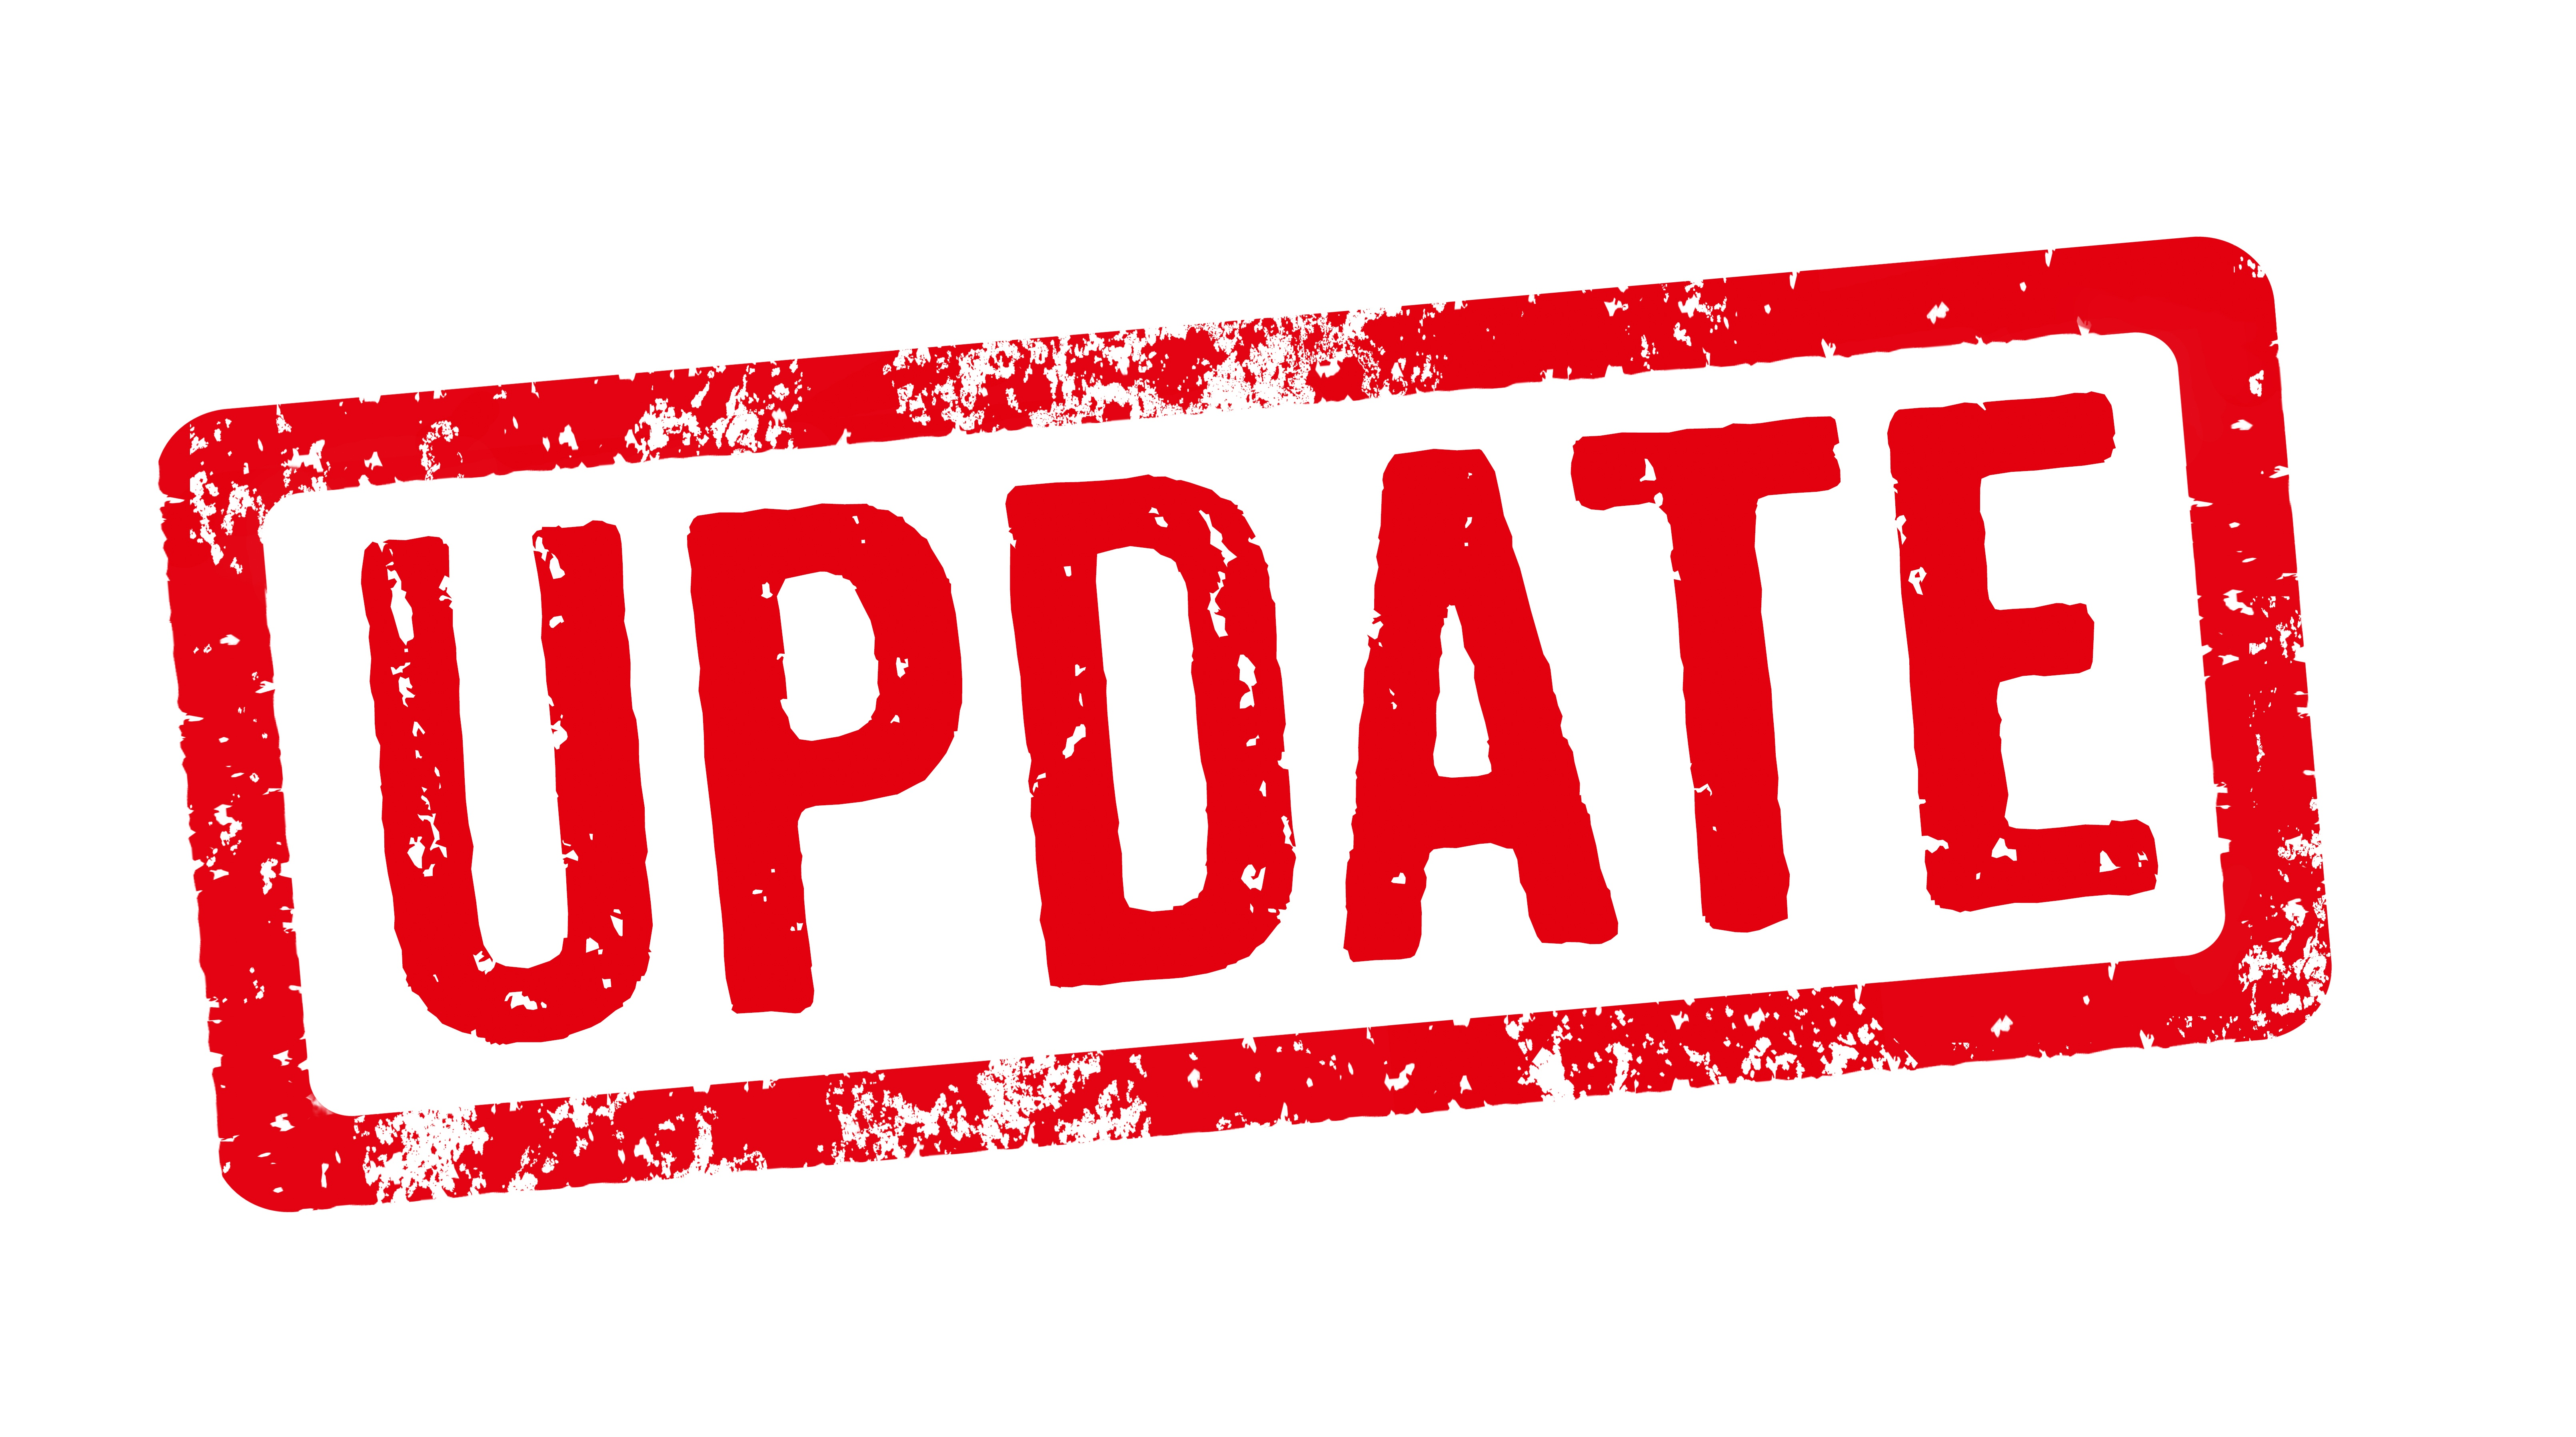 Pbj Update Suppressed Star Ratings Tracking Turnover Amp More